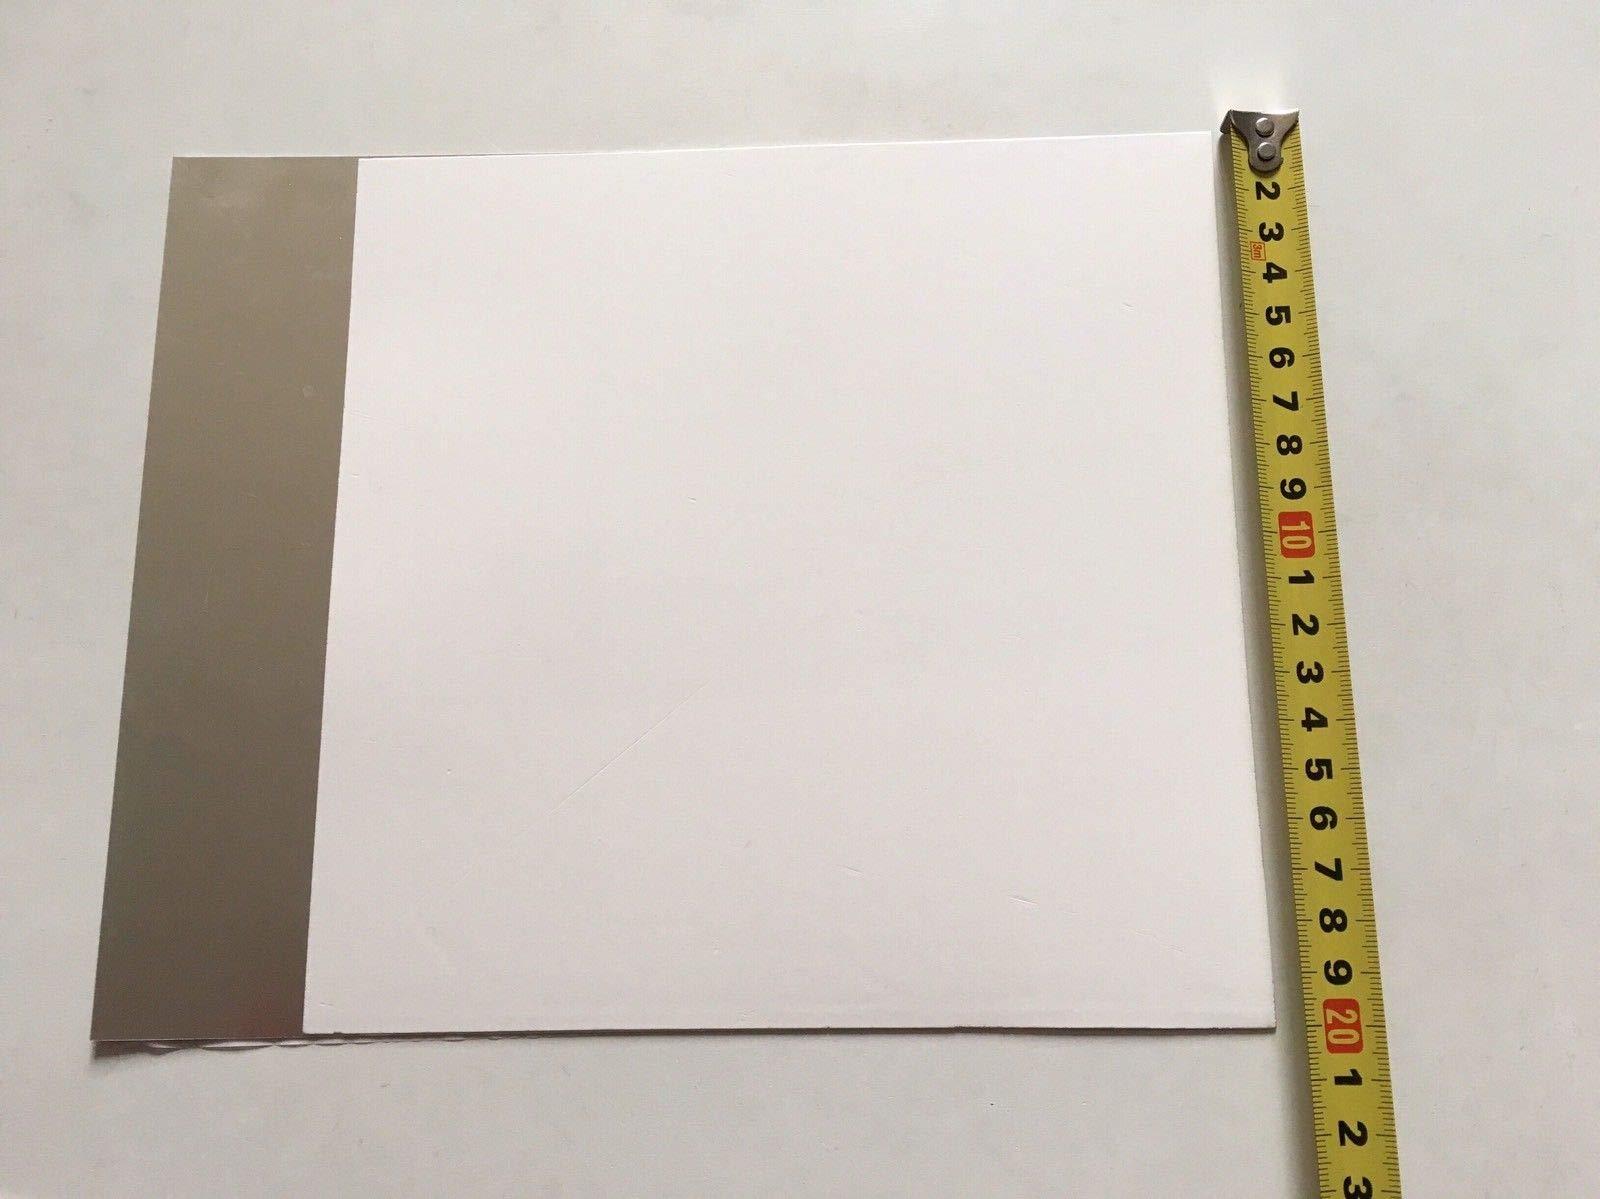 AAdvance Instruments TLC Plates Aluminum Backed Silica Gel 60 F254 20cm x 20cm 12/Box by AAdvance Instruments